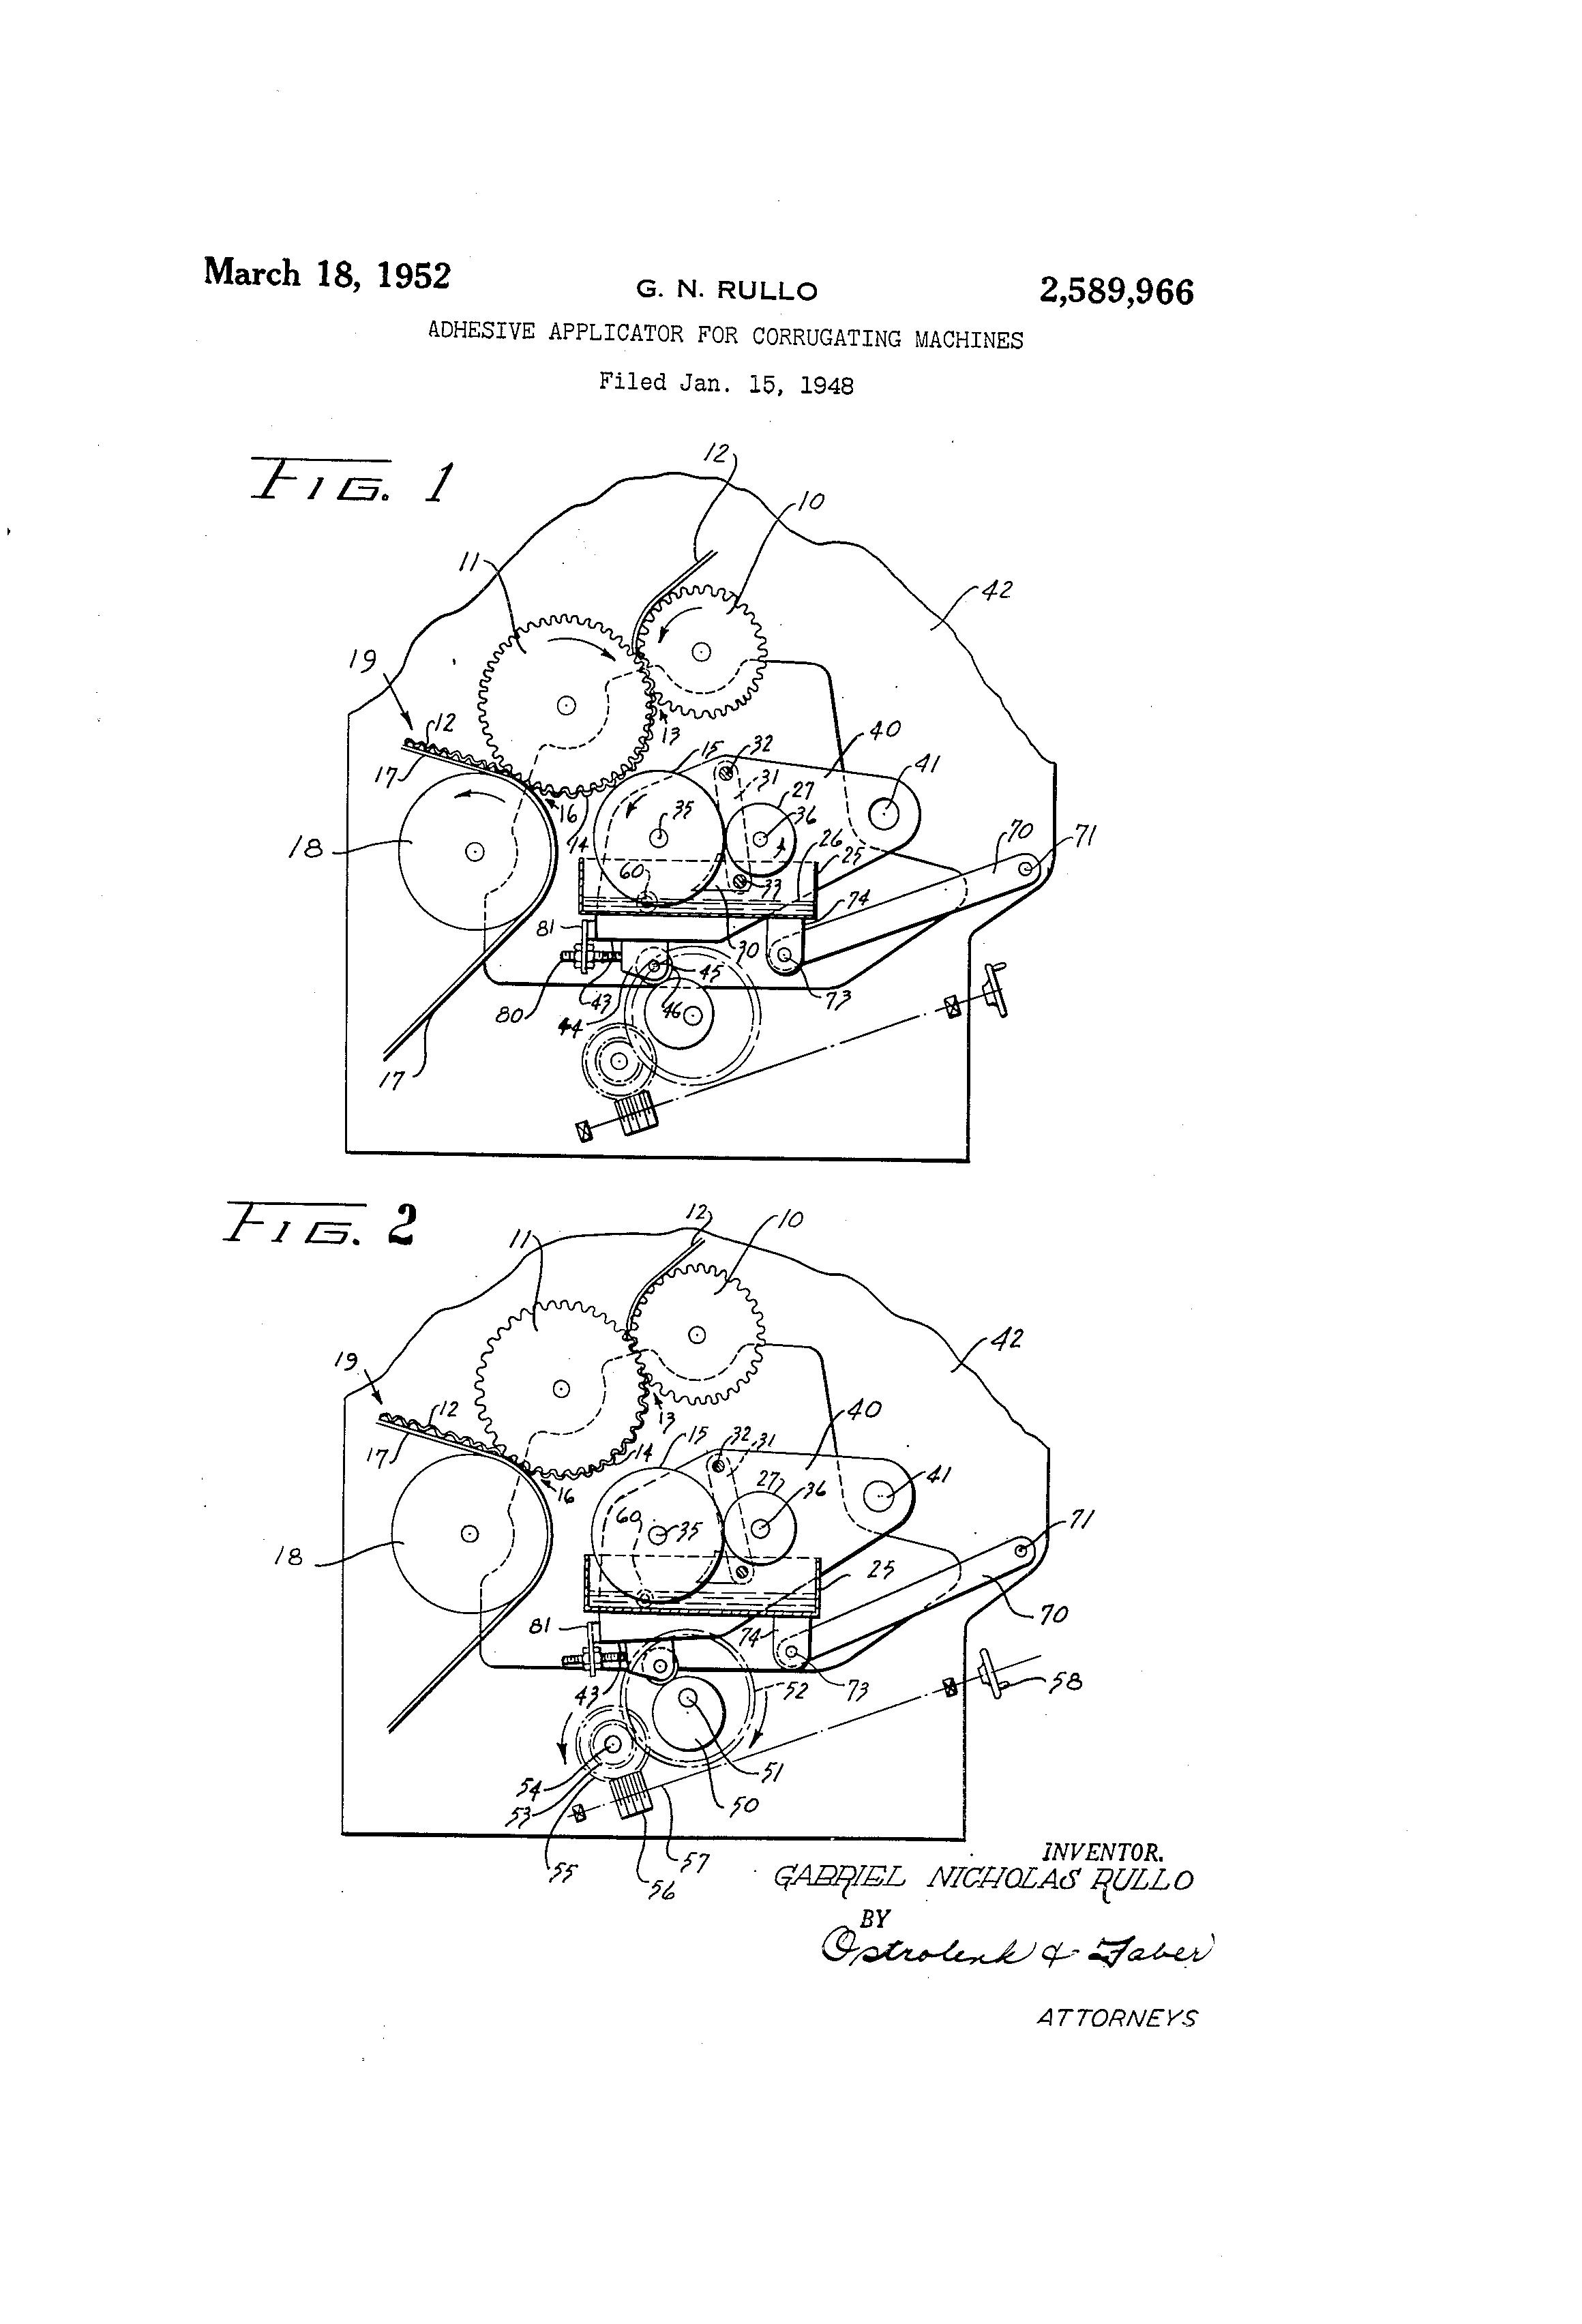 Patent US2589966 - Adhesive applicator for corrugating